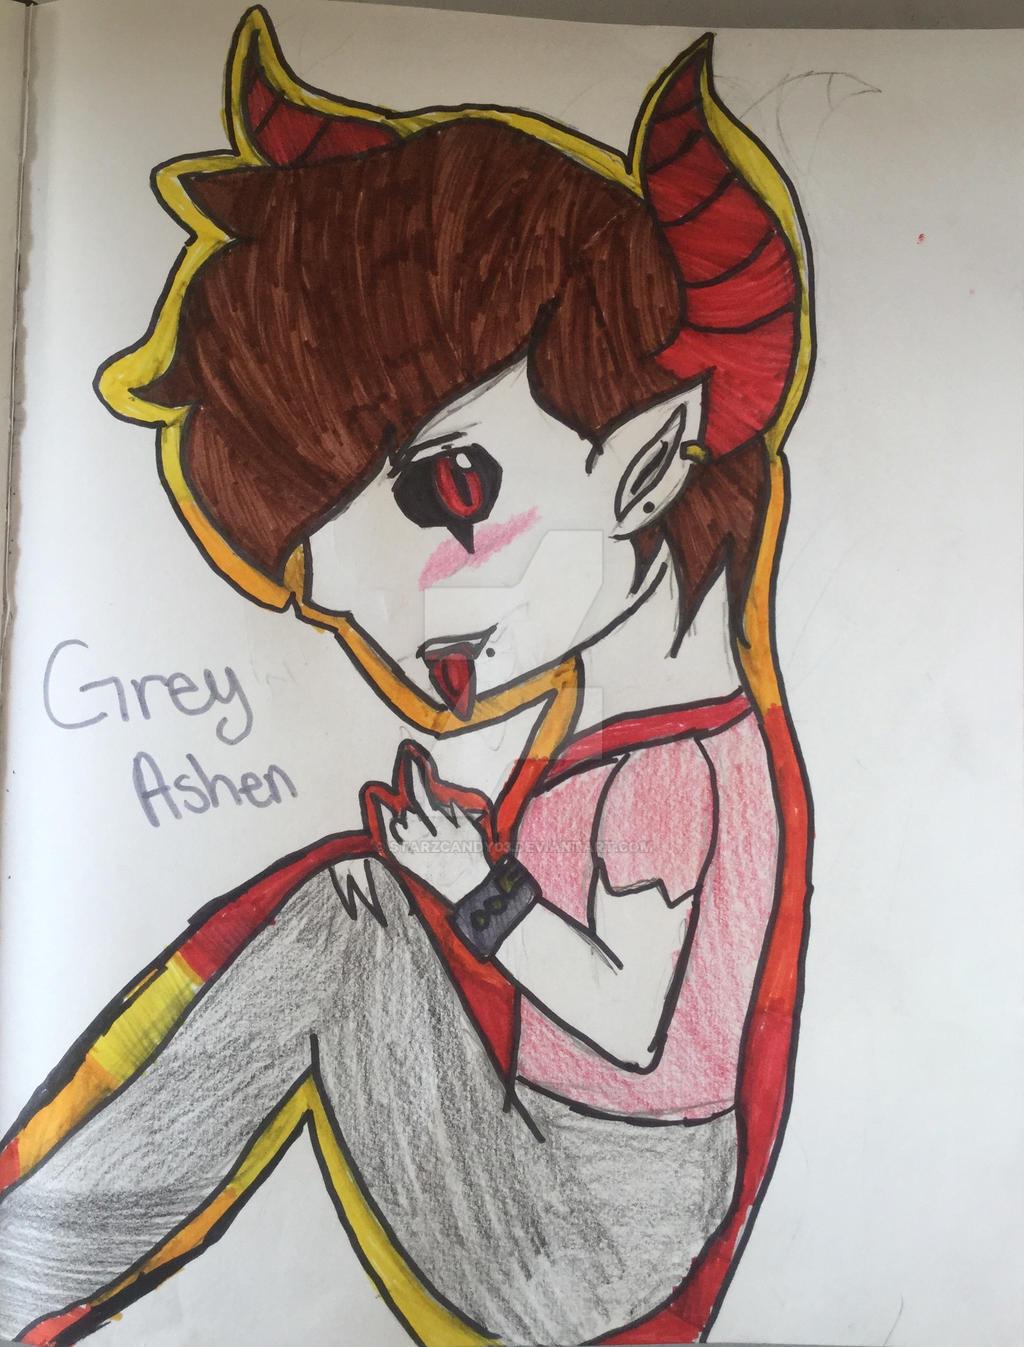 Grey Ashen by StarZCandy03